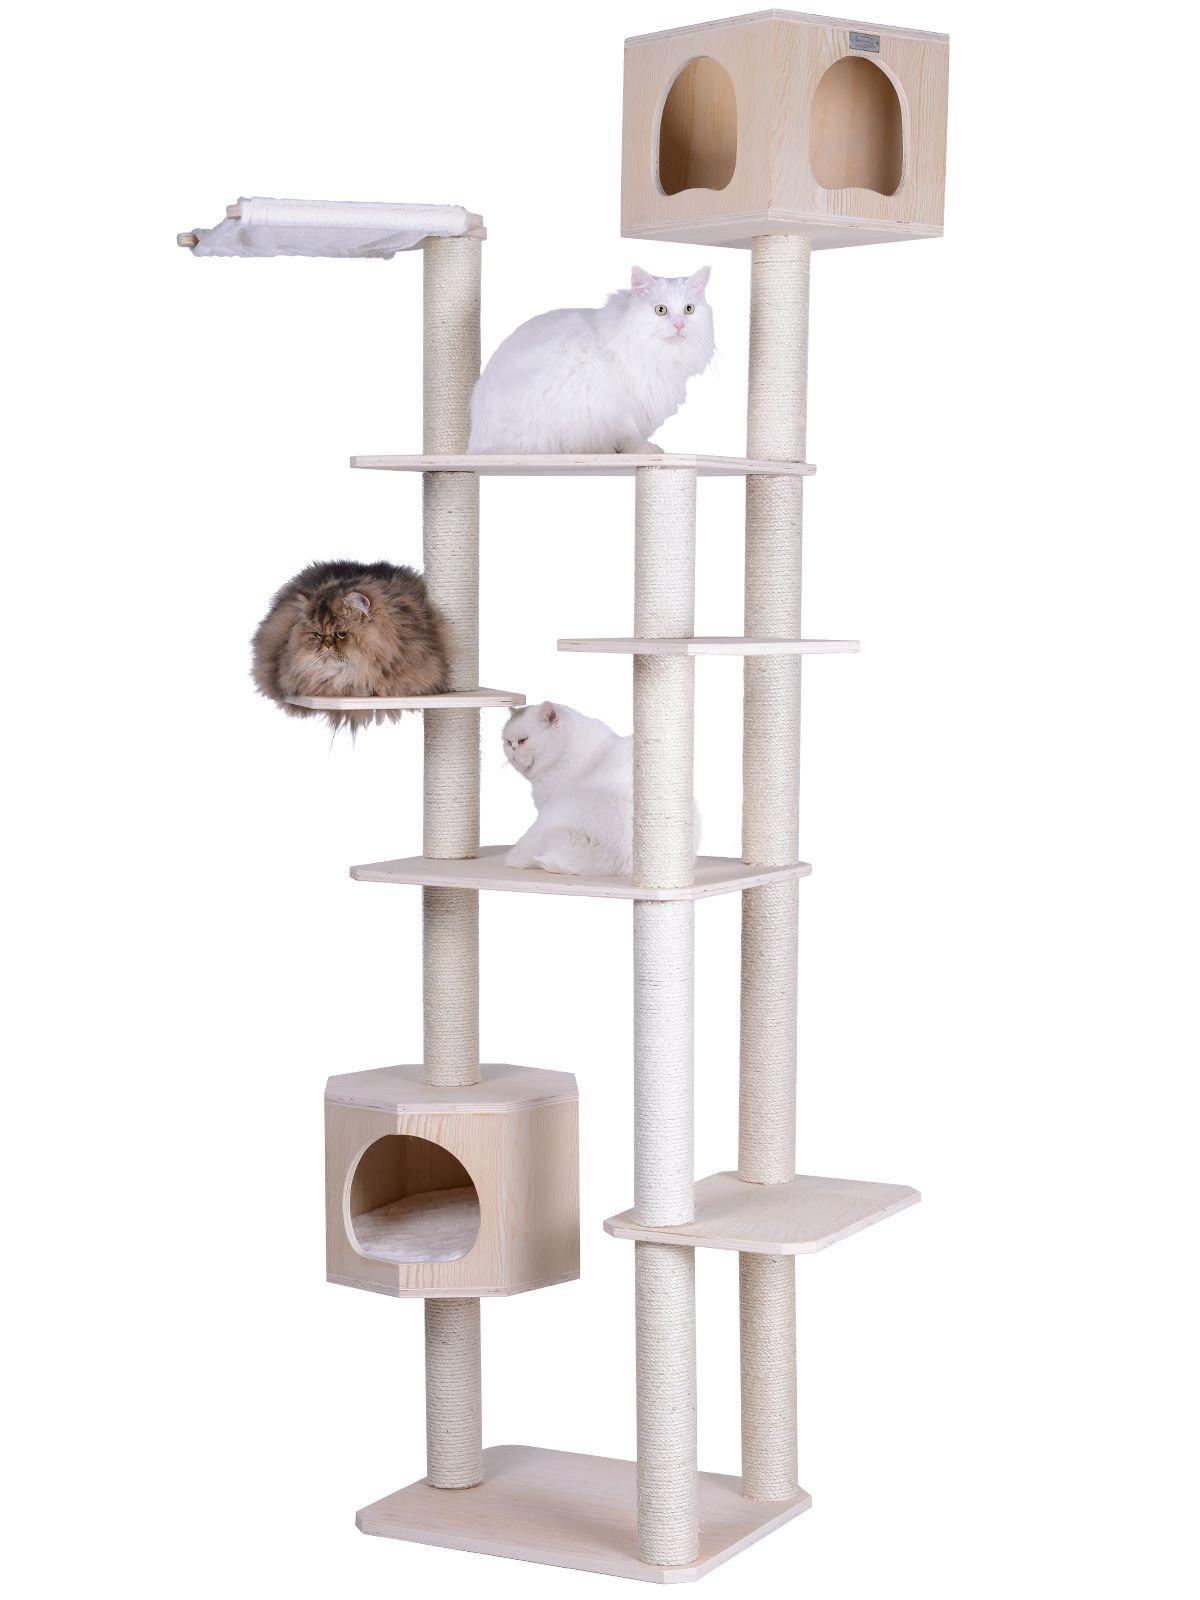 Armarkat 89 inch Premium Solid Wood Cat Tree Tower